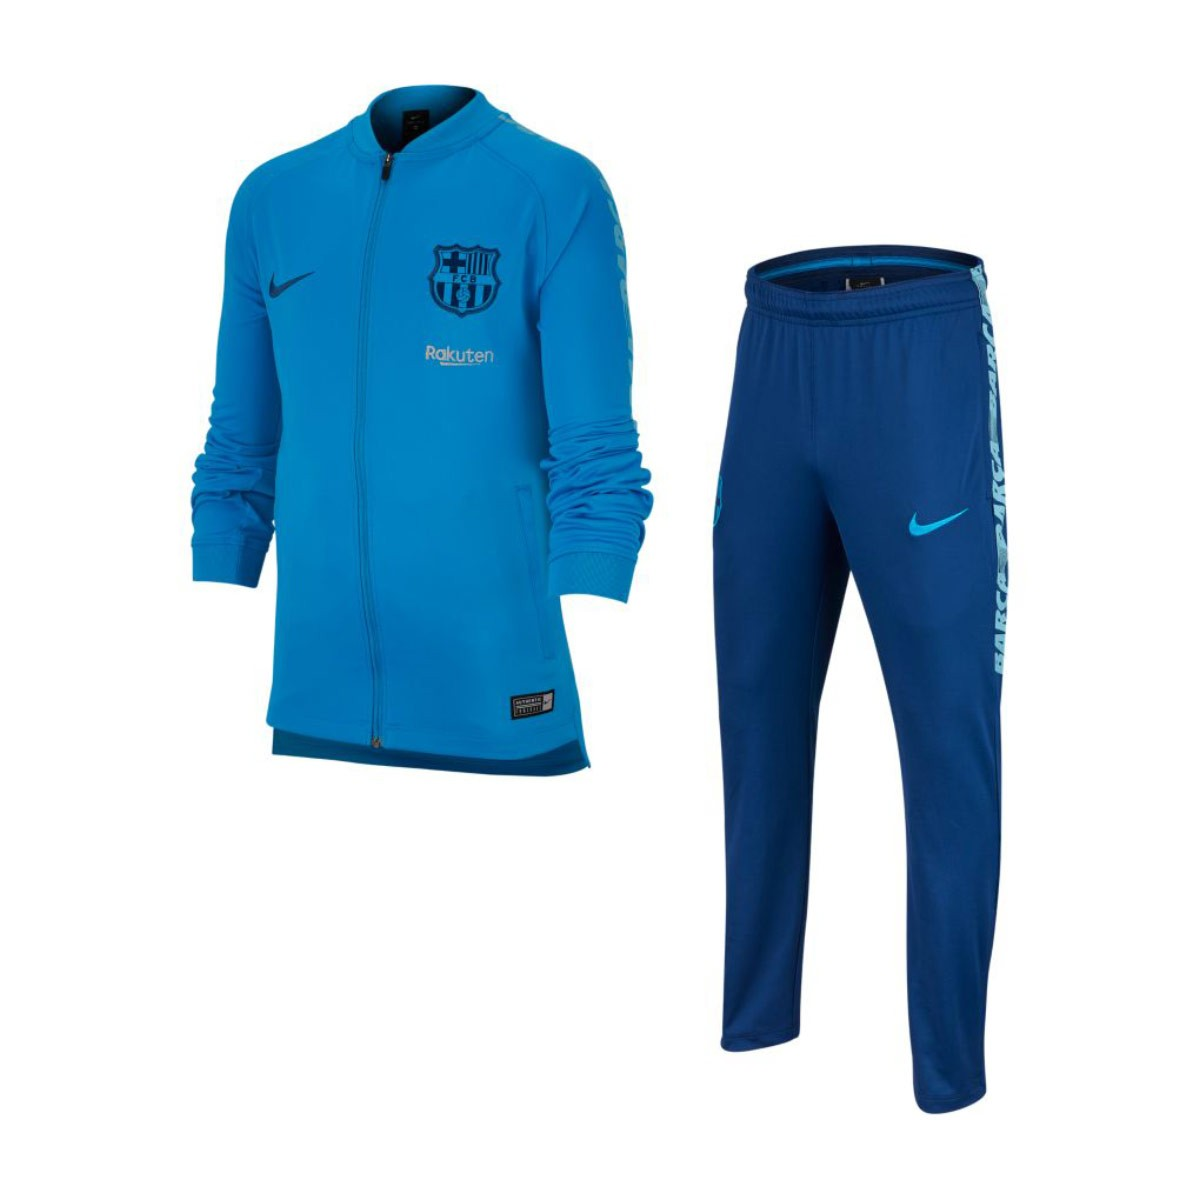 Chándal Nike Dry FC Barcelona Squad 2018-2019 Niño Equator blue-Vivil  sky-Coastal blue - Soloporteros es ahora Fútbol Emotion 535a80beac5cf